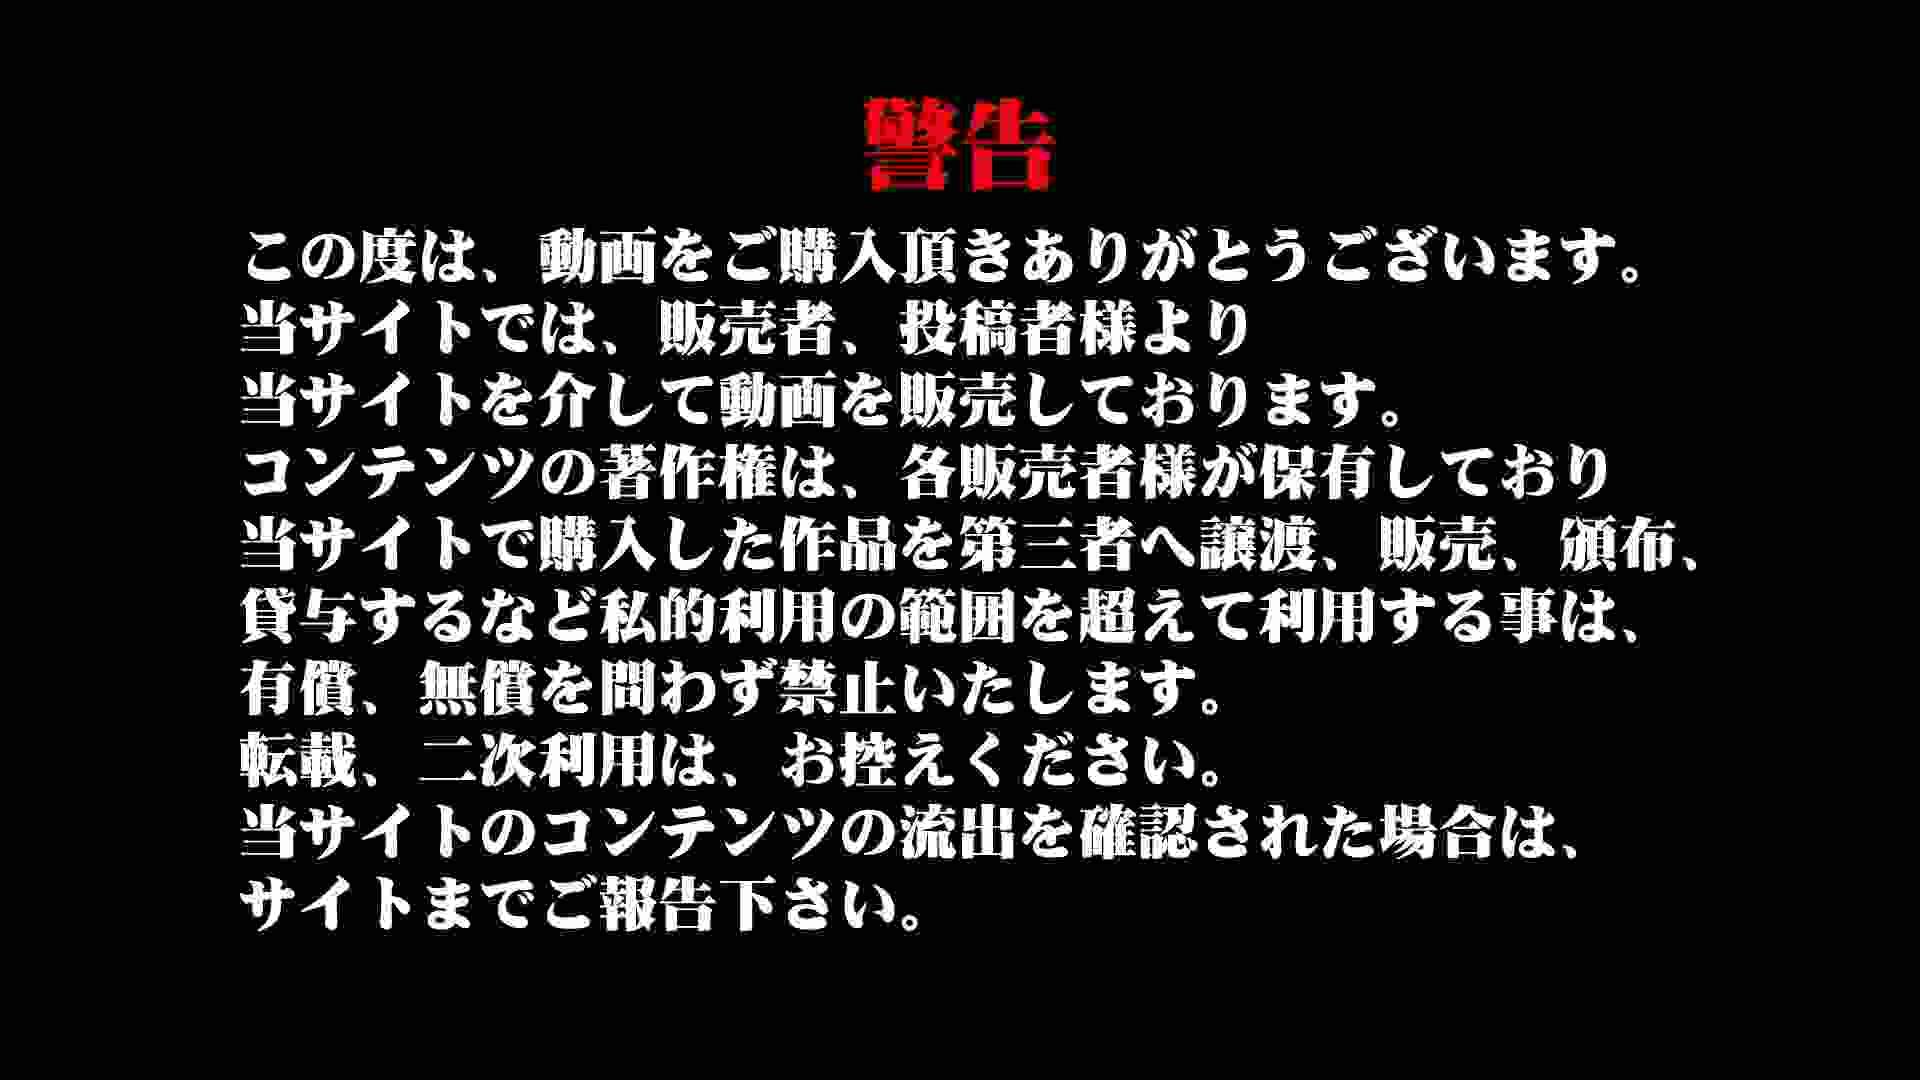 Aquaな露天風呂Vol.924 盗撮シリーズ | 露天風呂編  108PIX 27